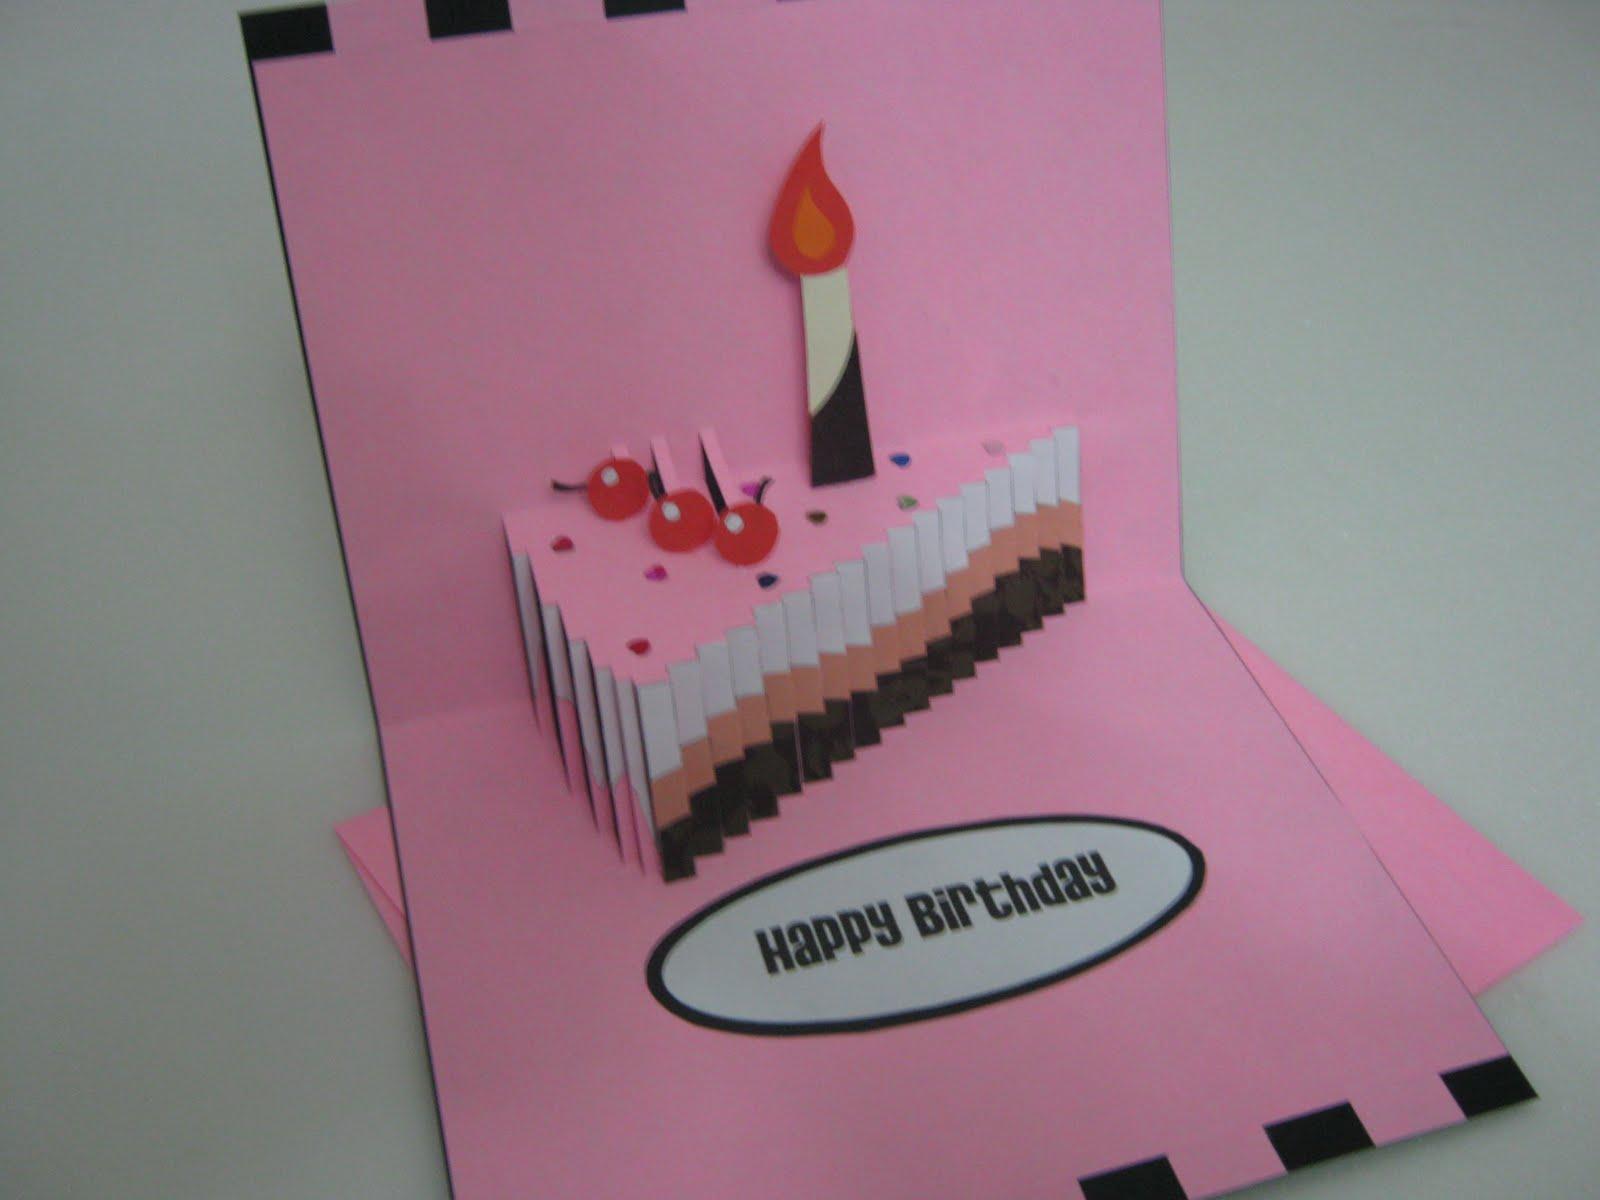 Картинки, как сделать открытку раскладушку торт